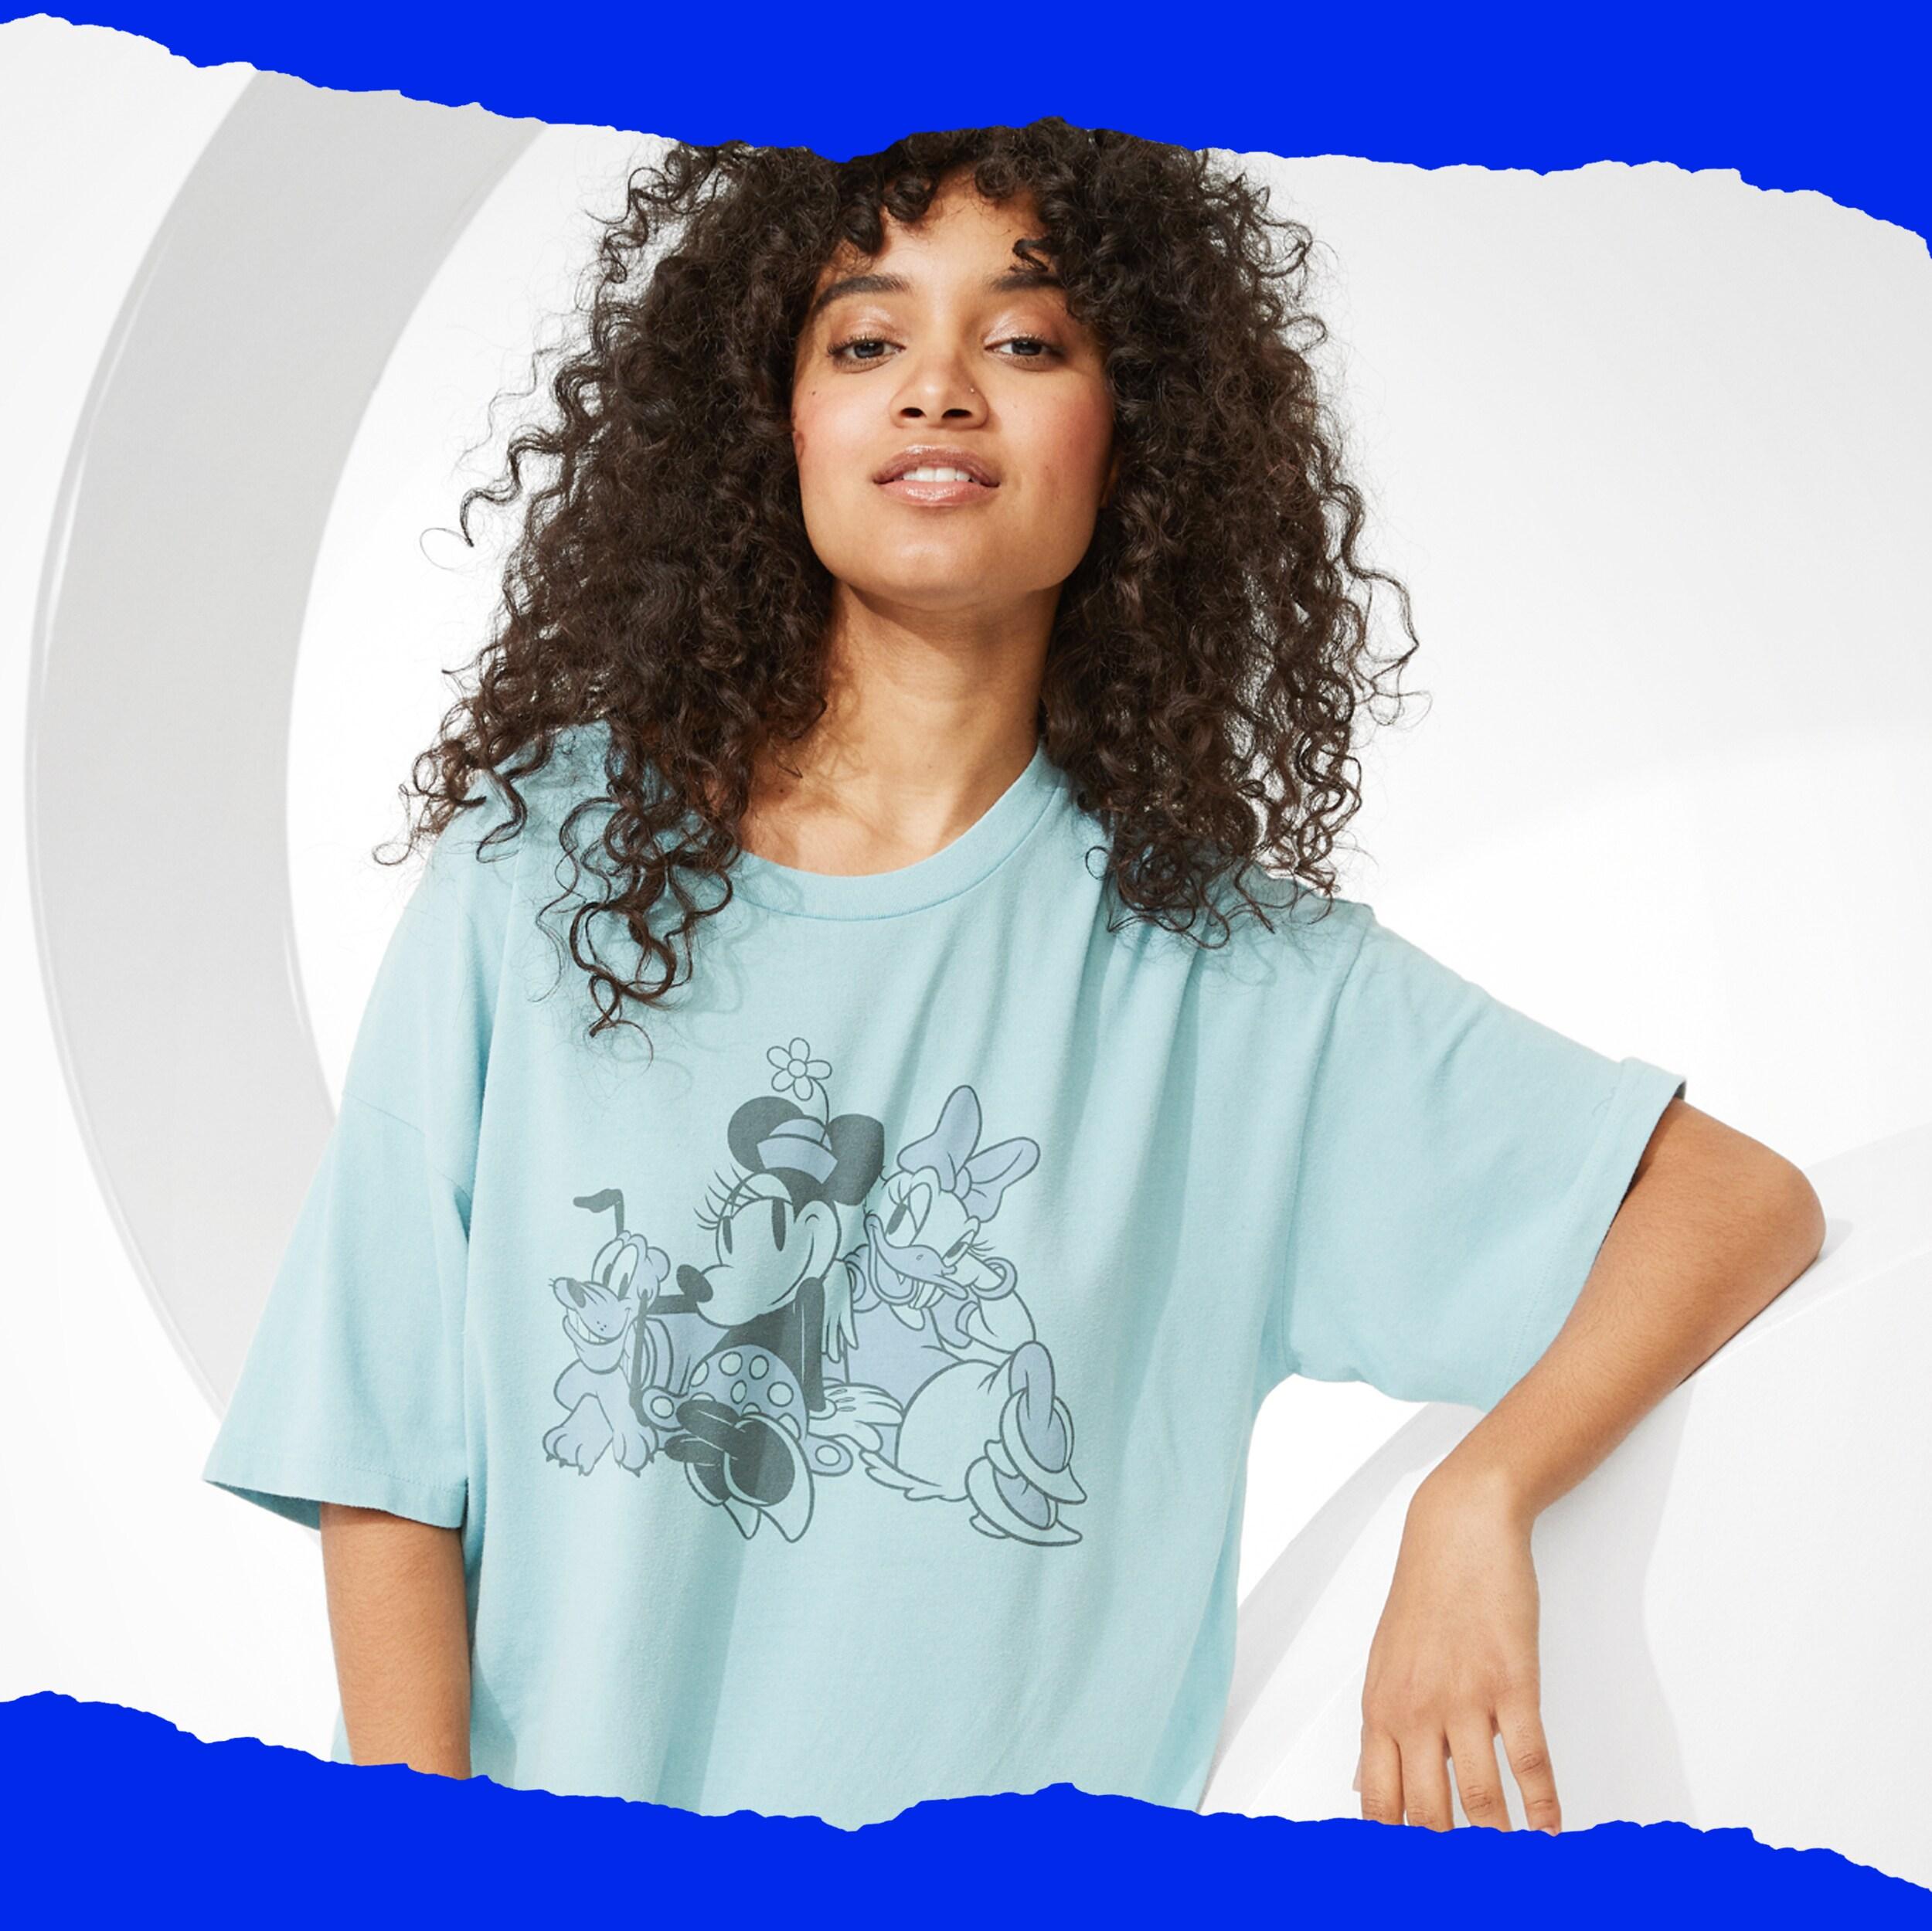 Disney X AE Oversized Graphic T-Shirt